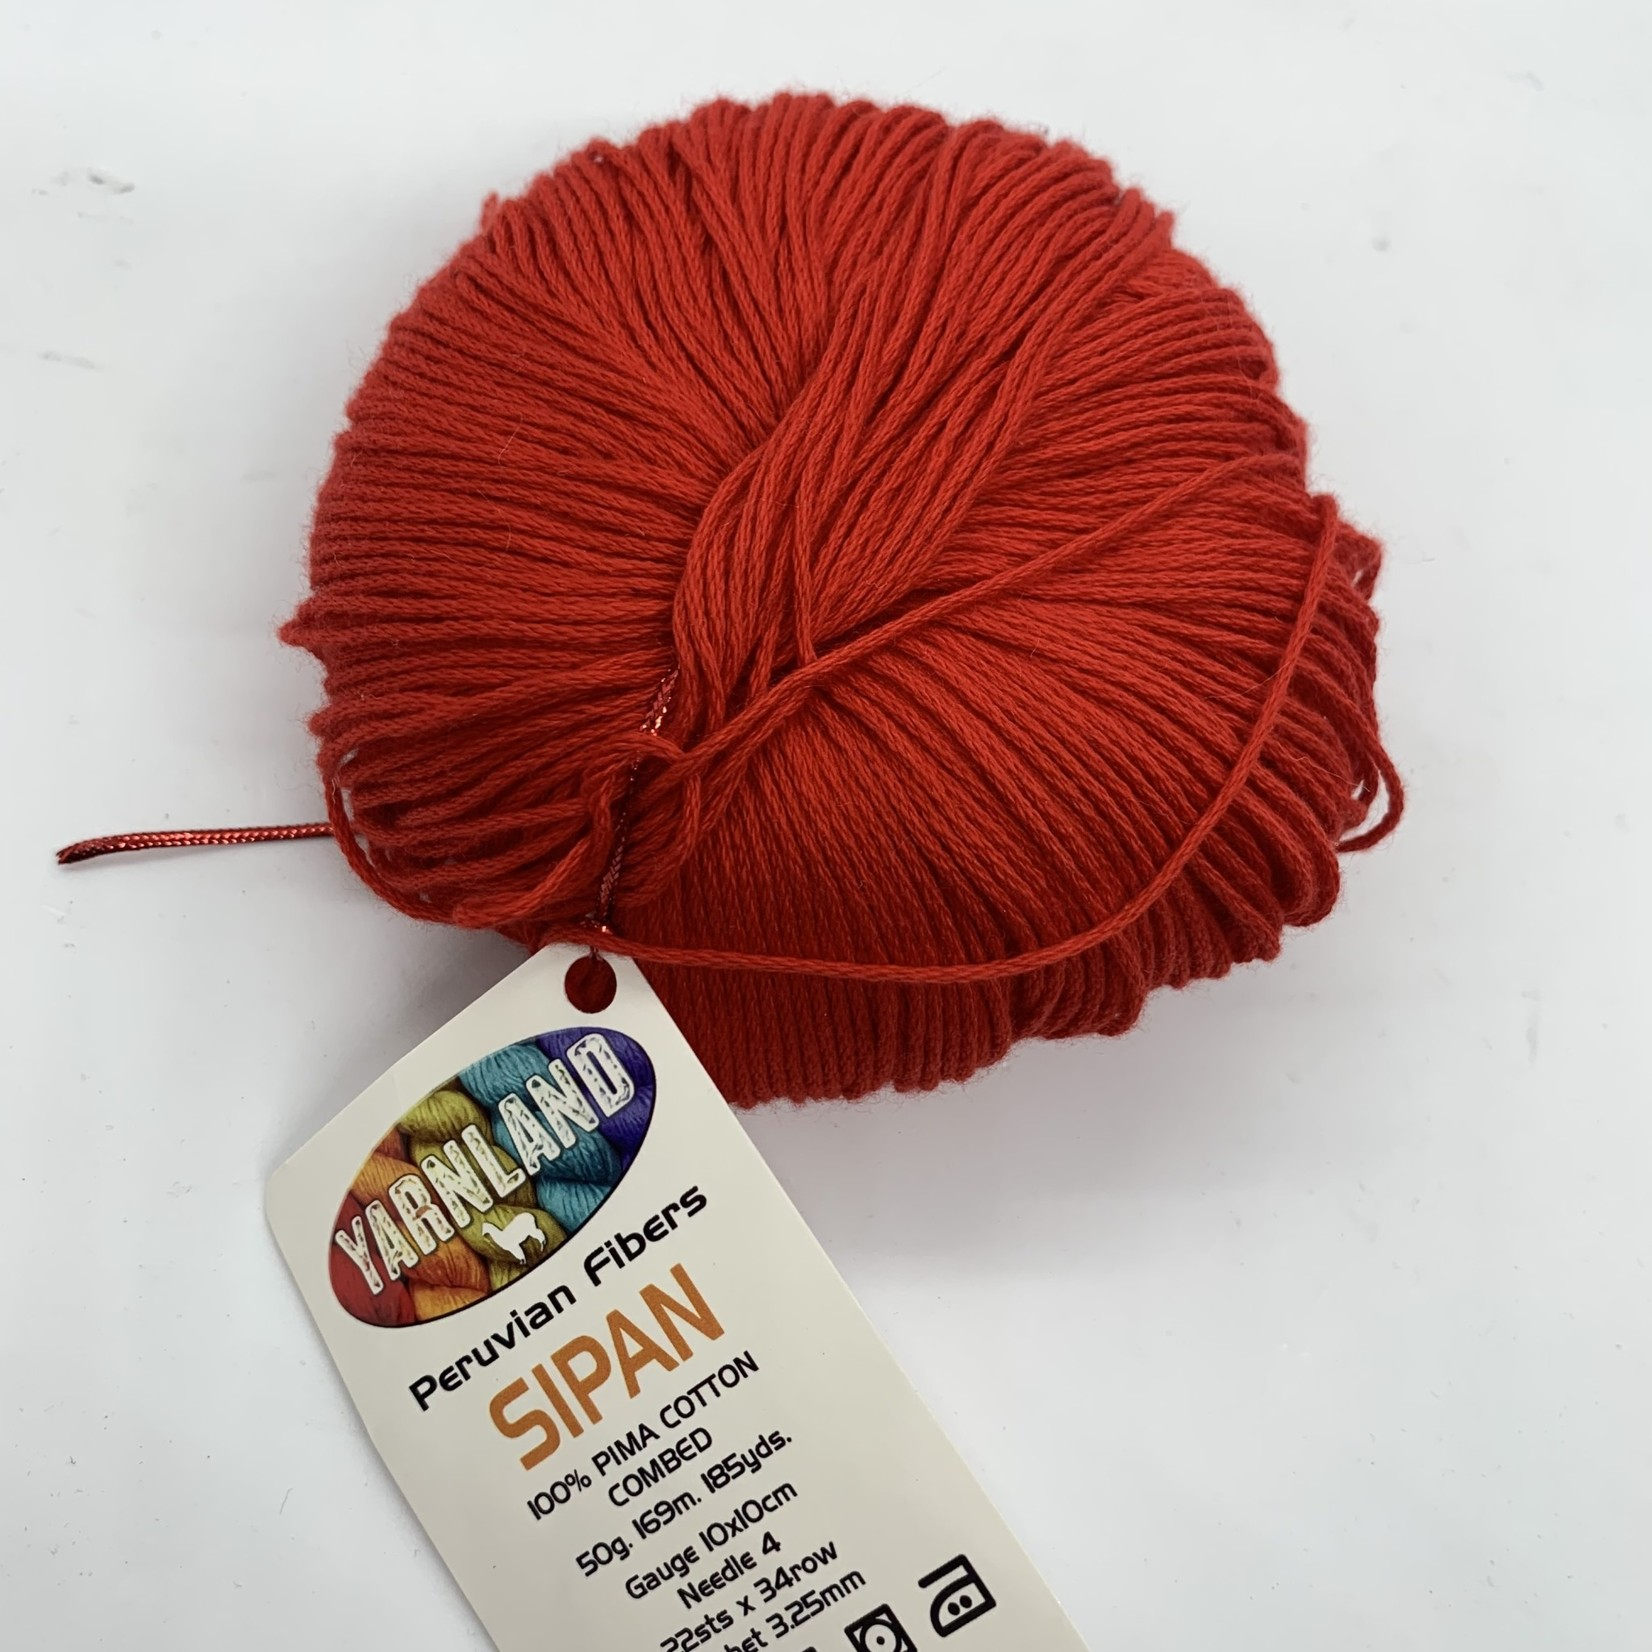 Yarnland - Sipan